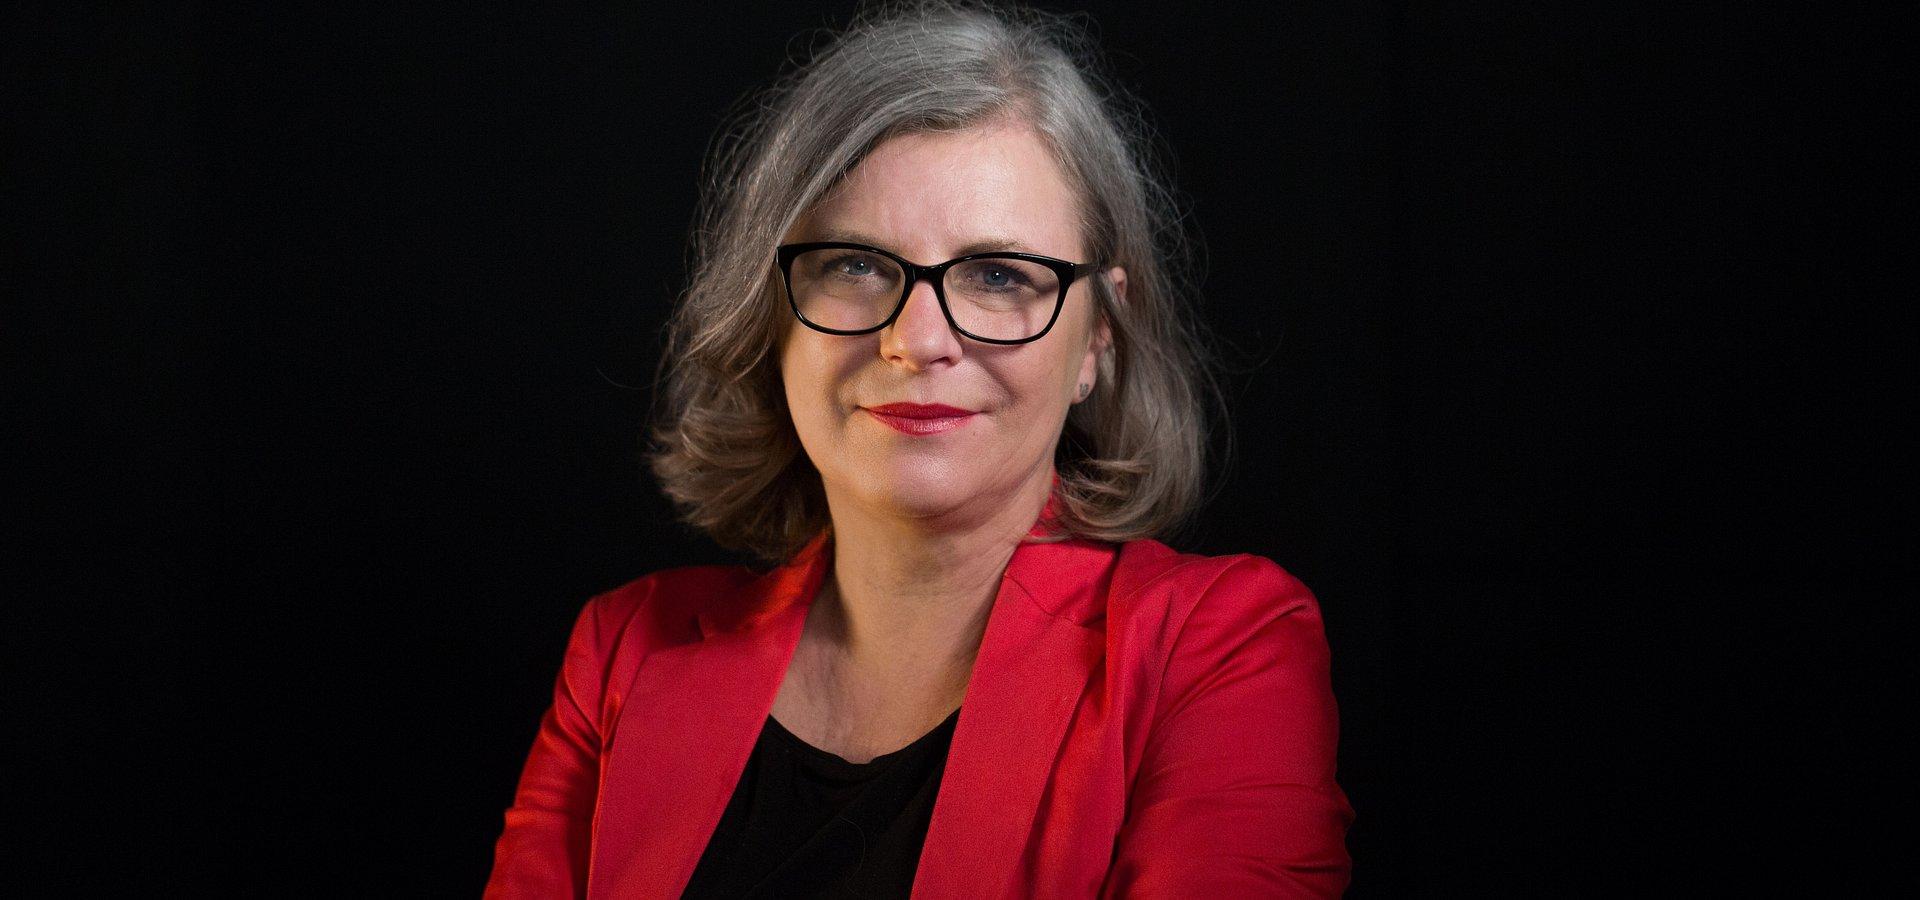 Prof. Dorota Merecz-Kot